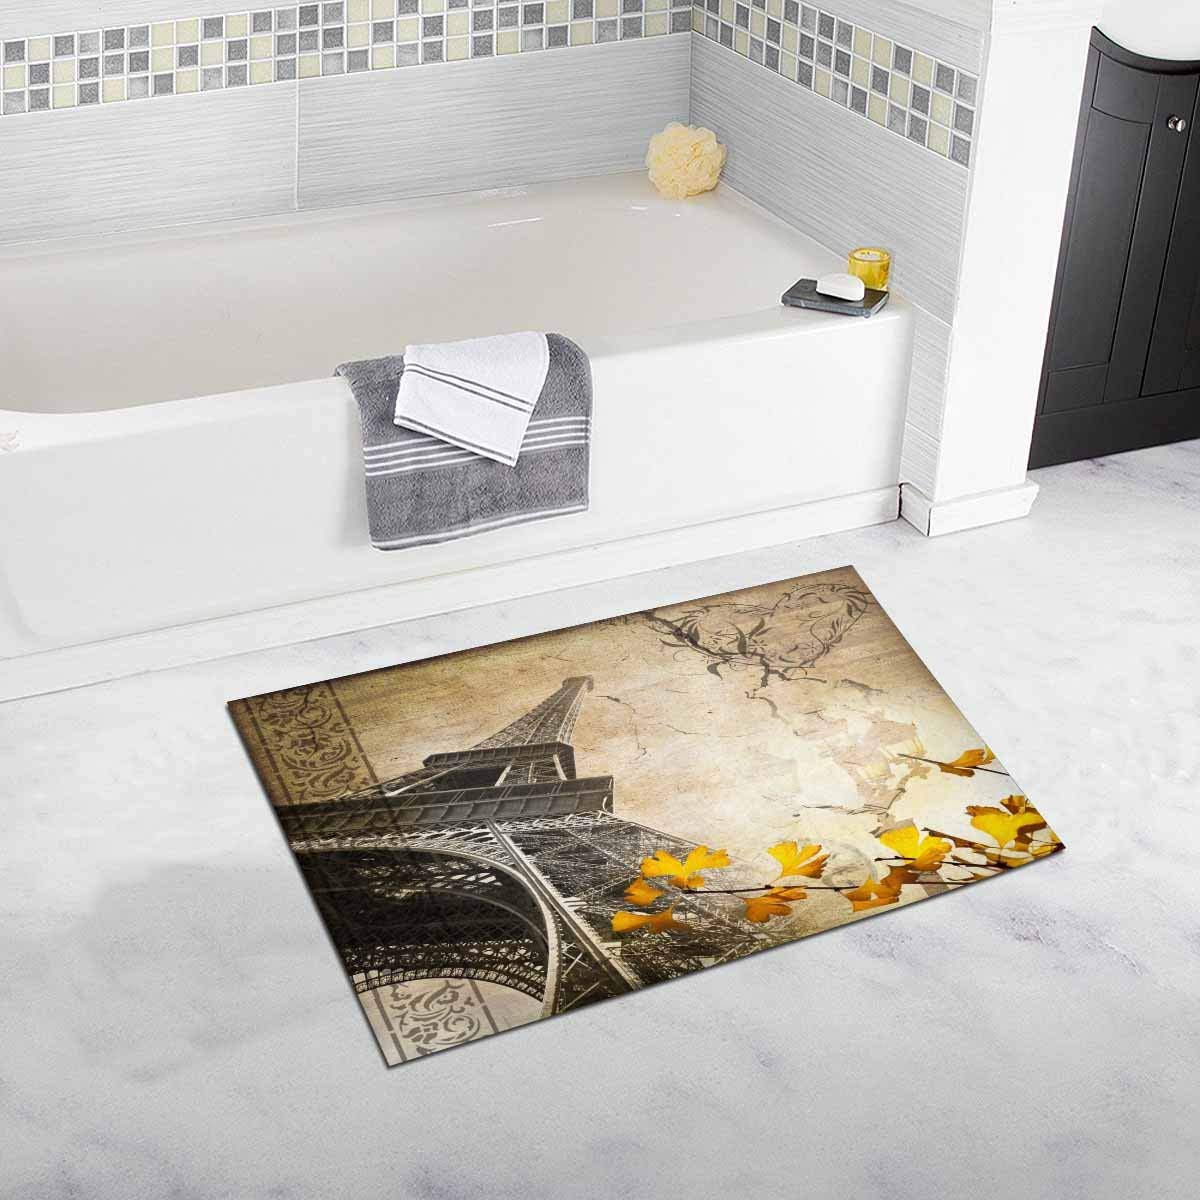 InterestPrint Romantic Vintage Paris Collage with the Eiffel Tower Luxury Microfiber Washable Bath Rug For Floor Bathroom Bedroom Living Room